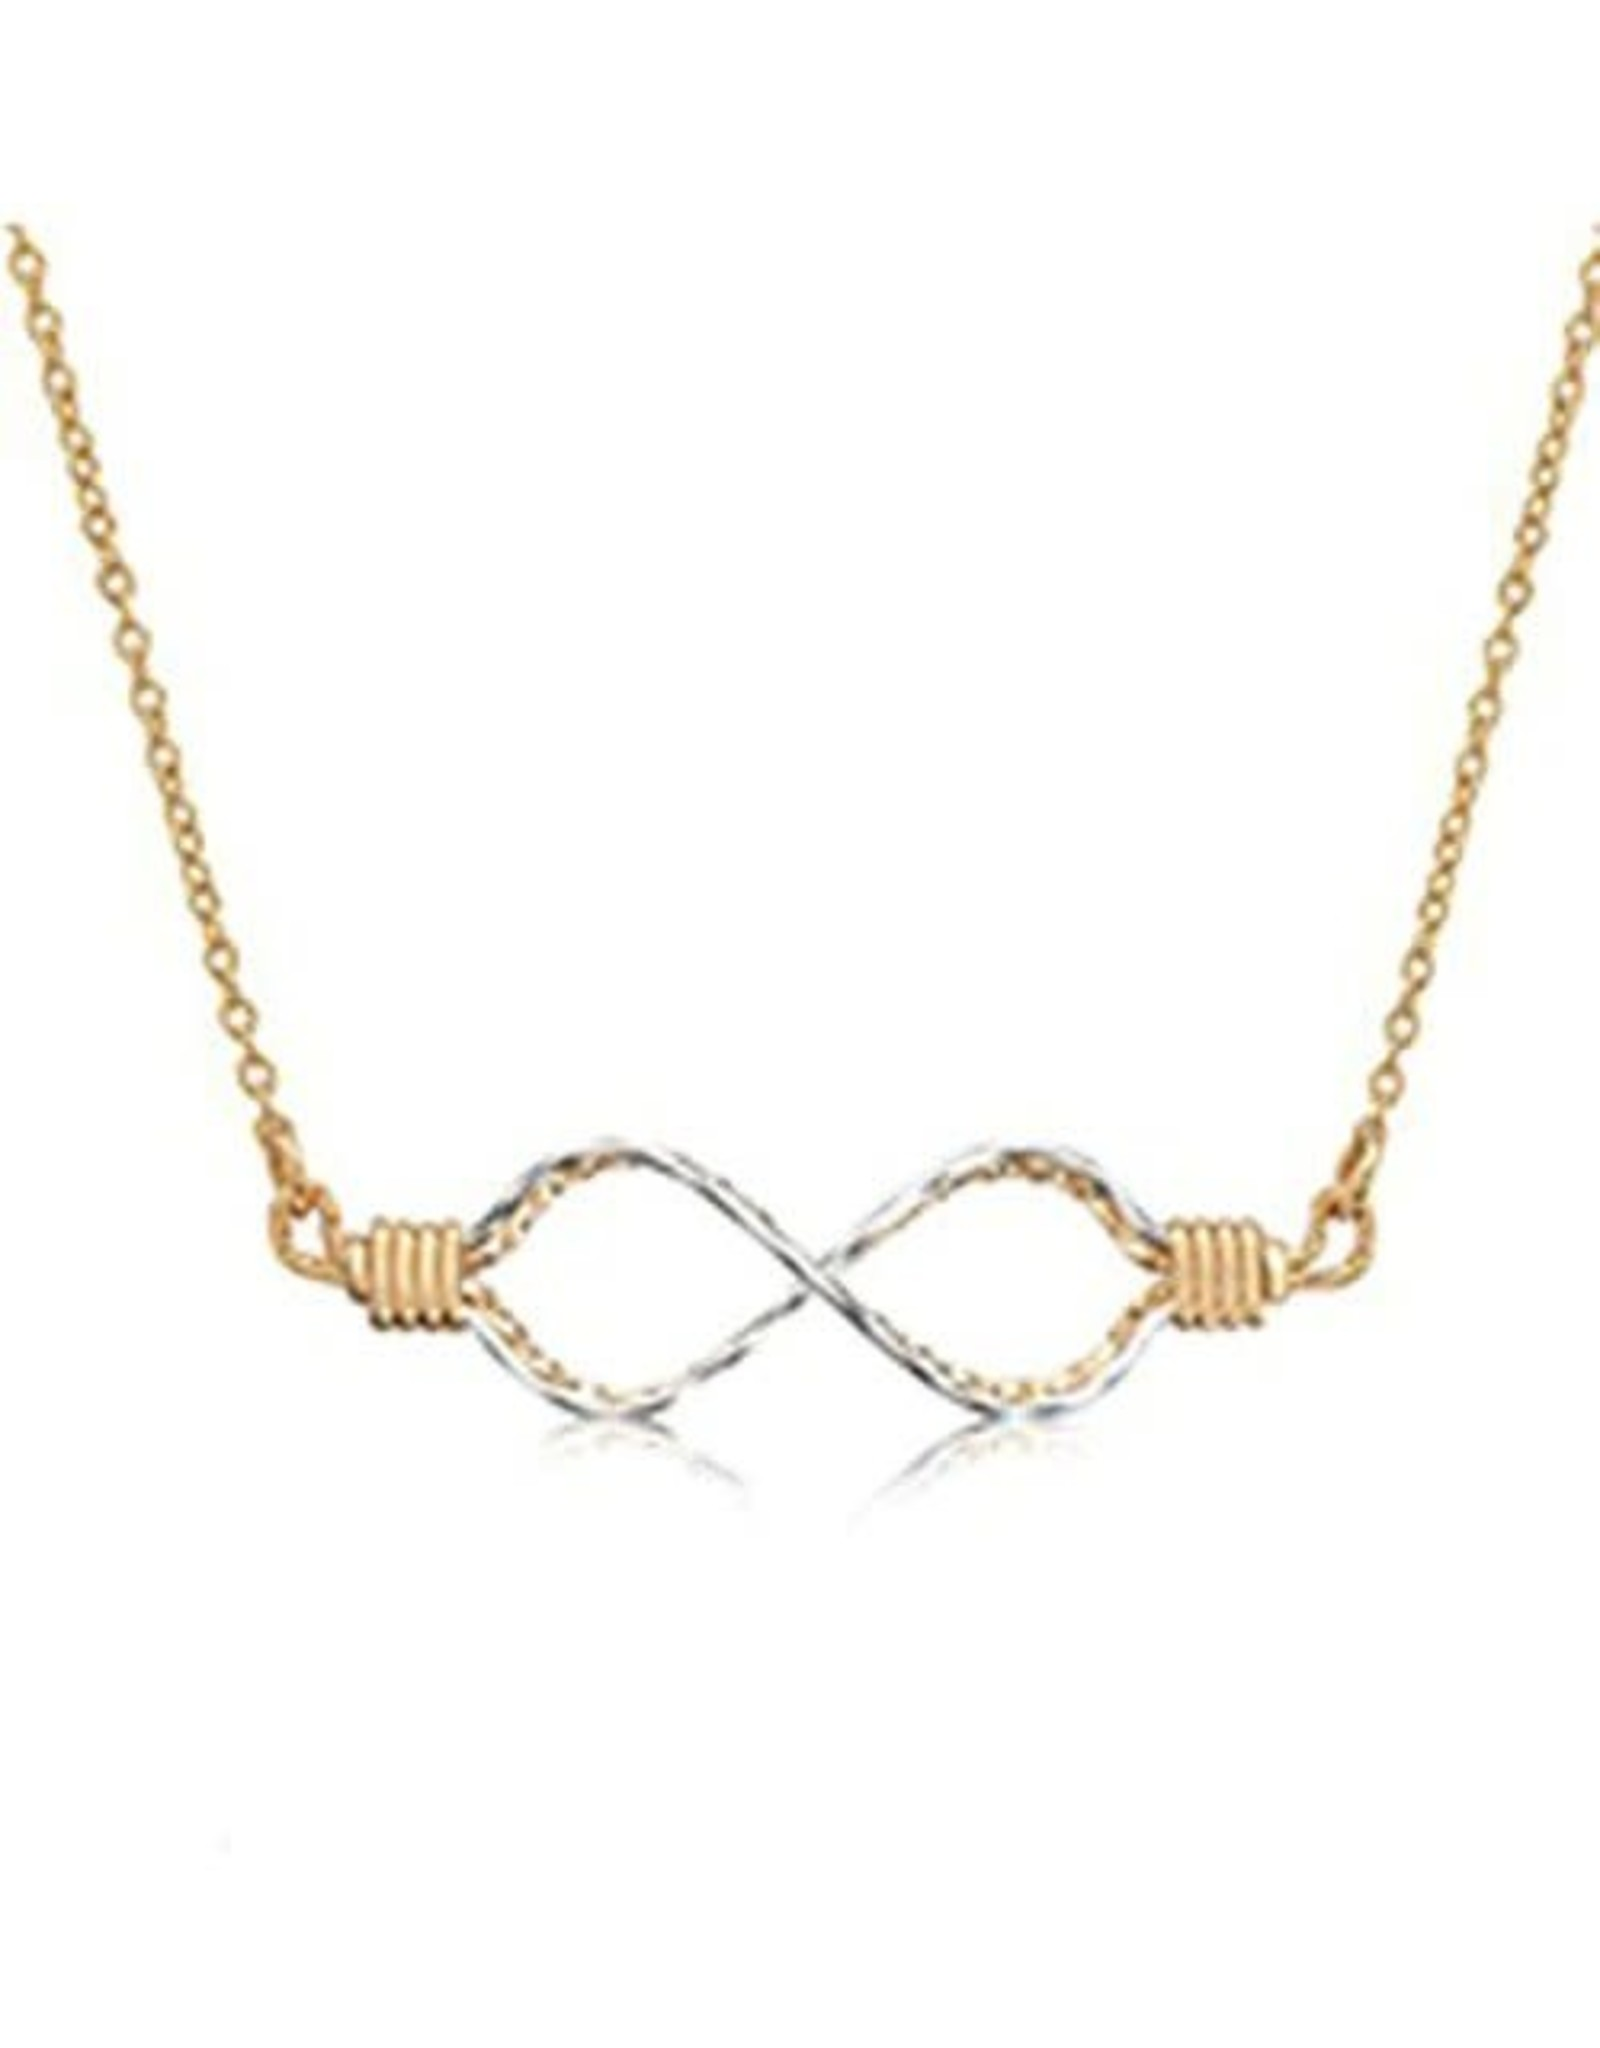 Ronaldo Ronaldo Infinity Necklace